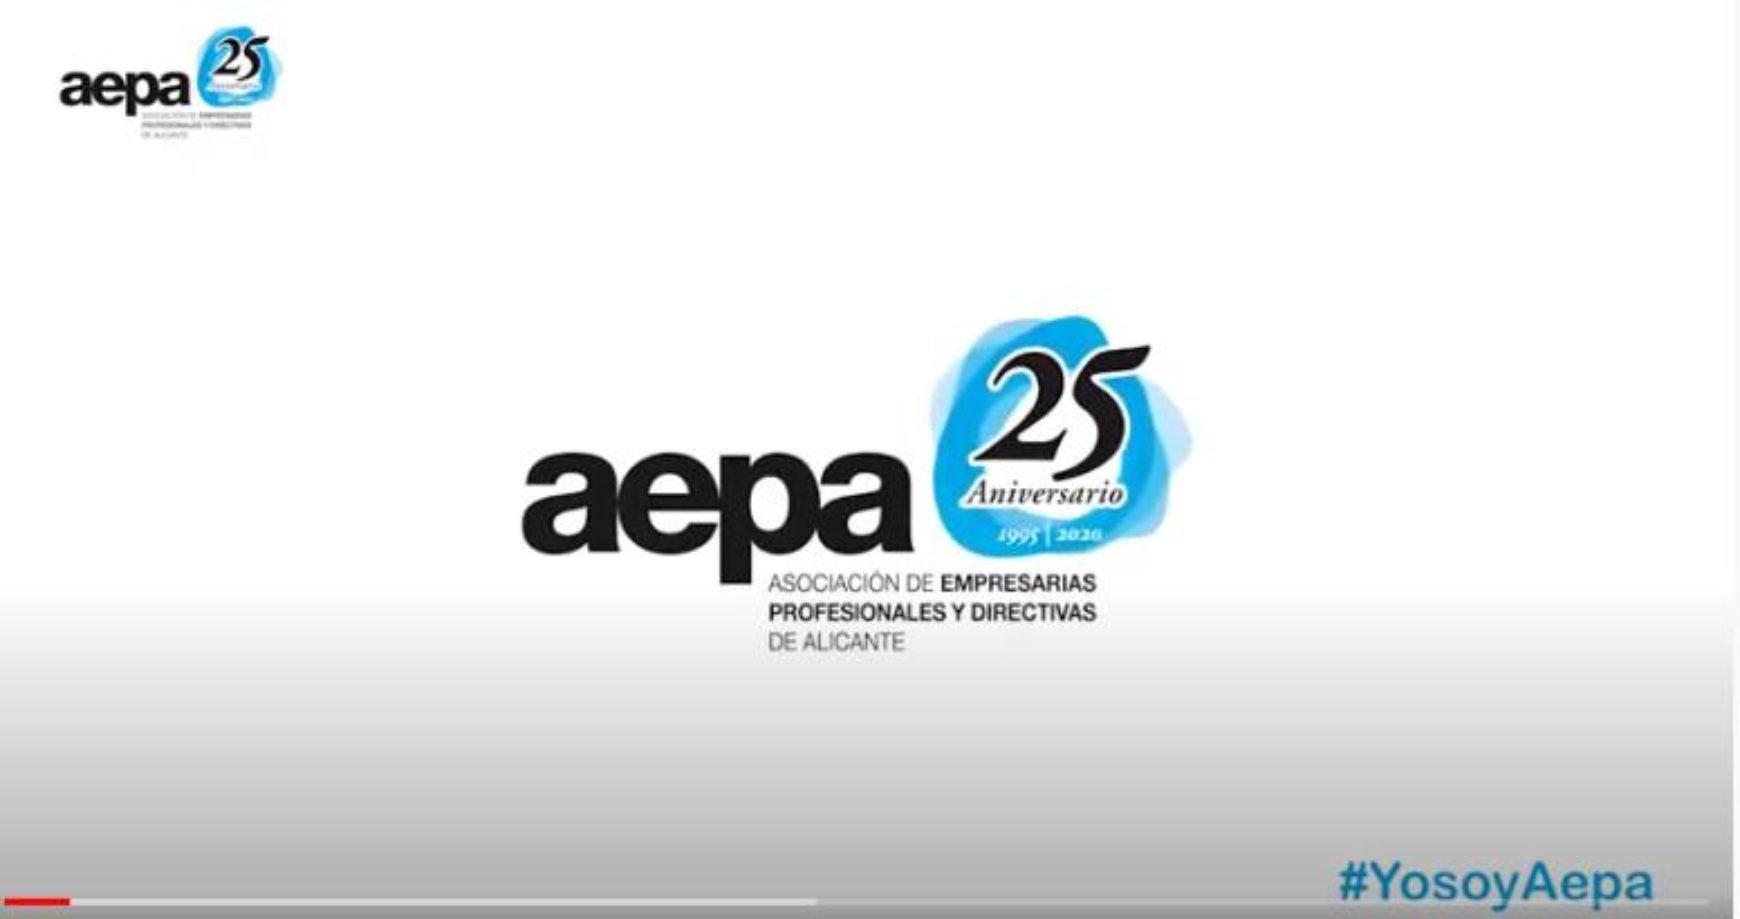 AEPA, siempre a tu lado